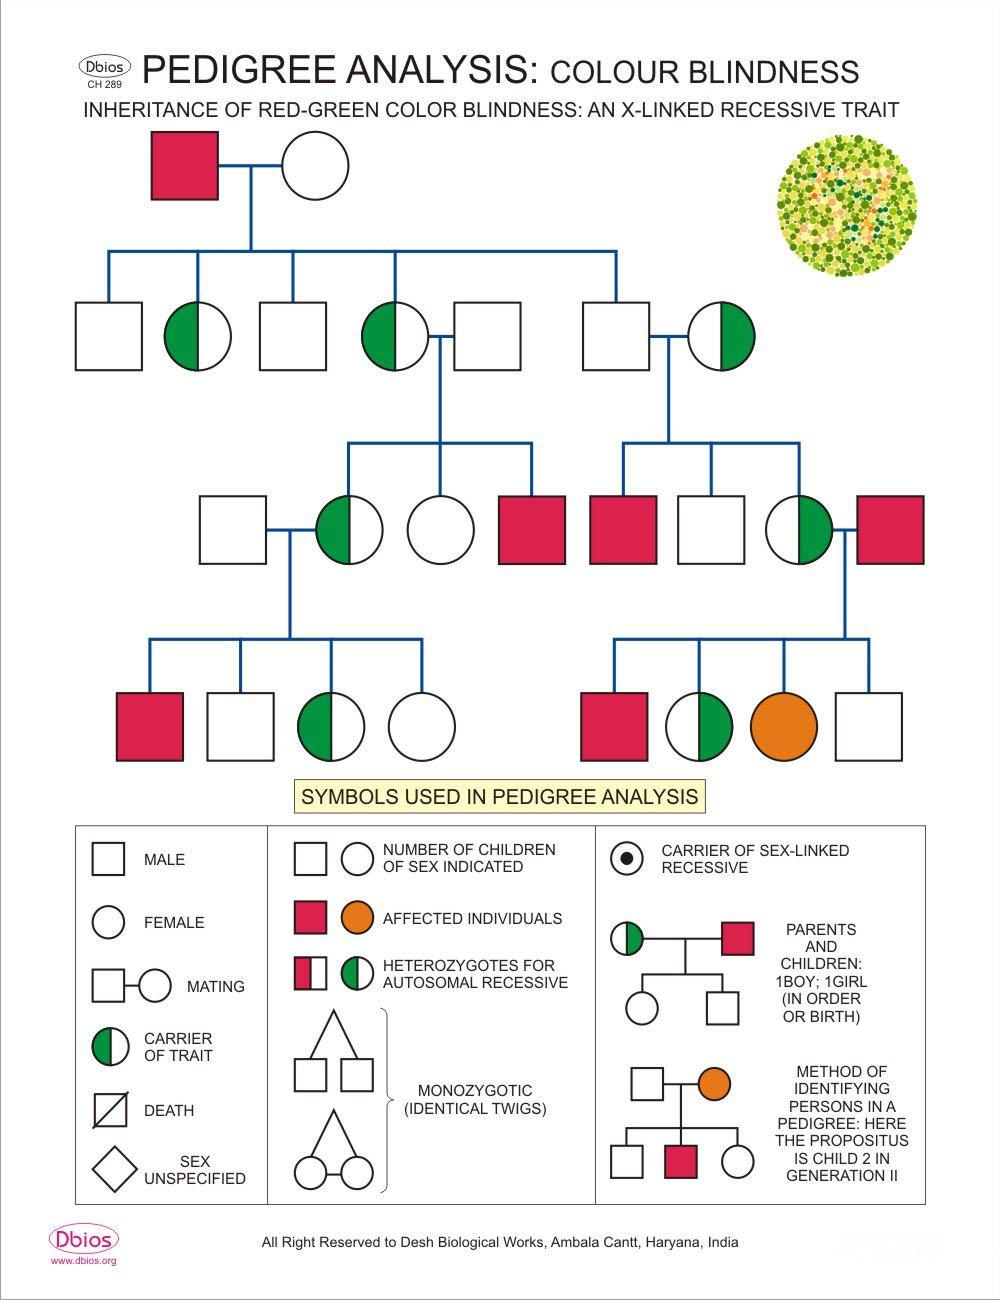 Dbios Digitally Printed Pedigree Analysis Colour Blindness Education